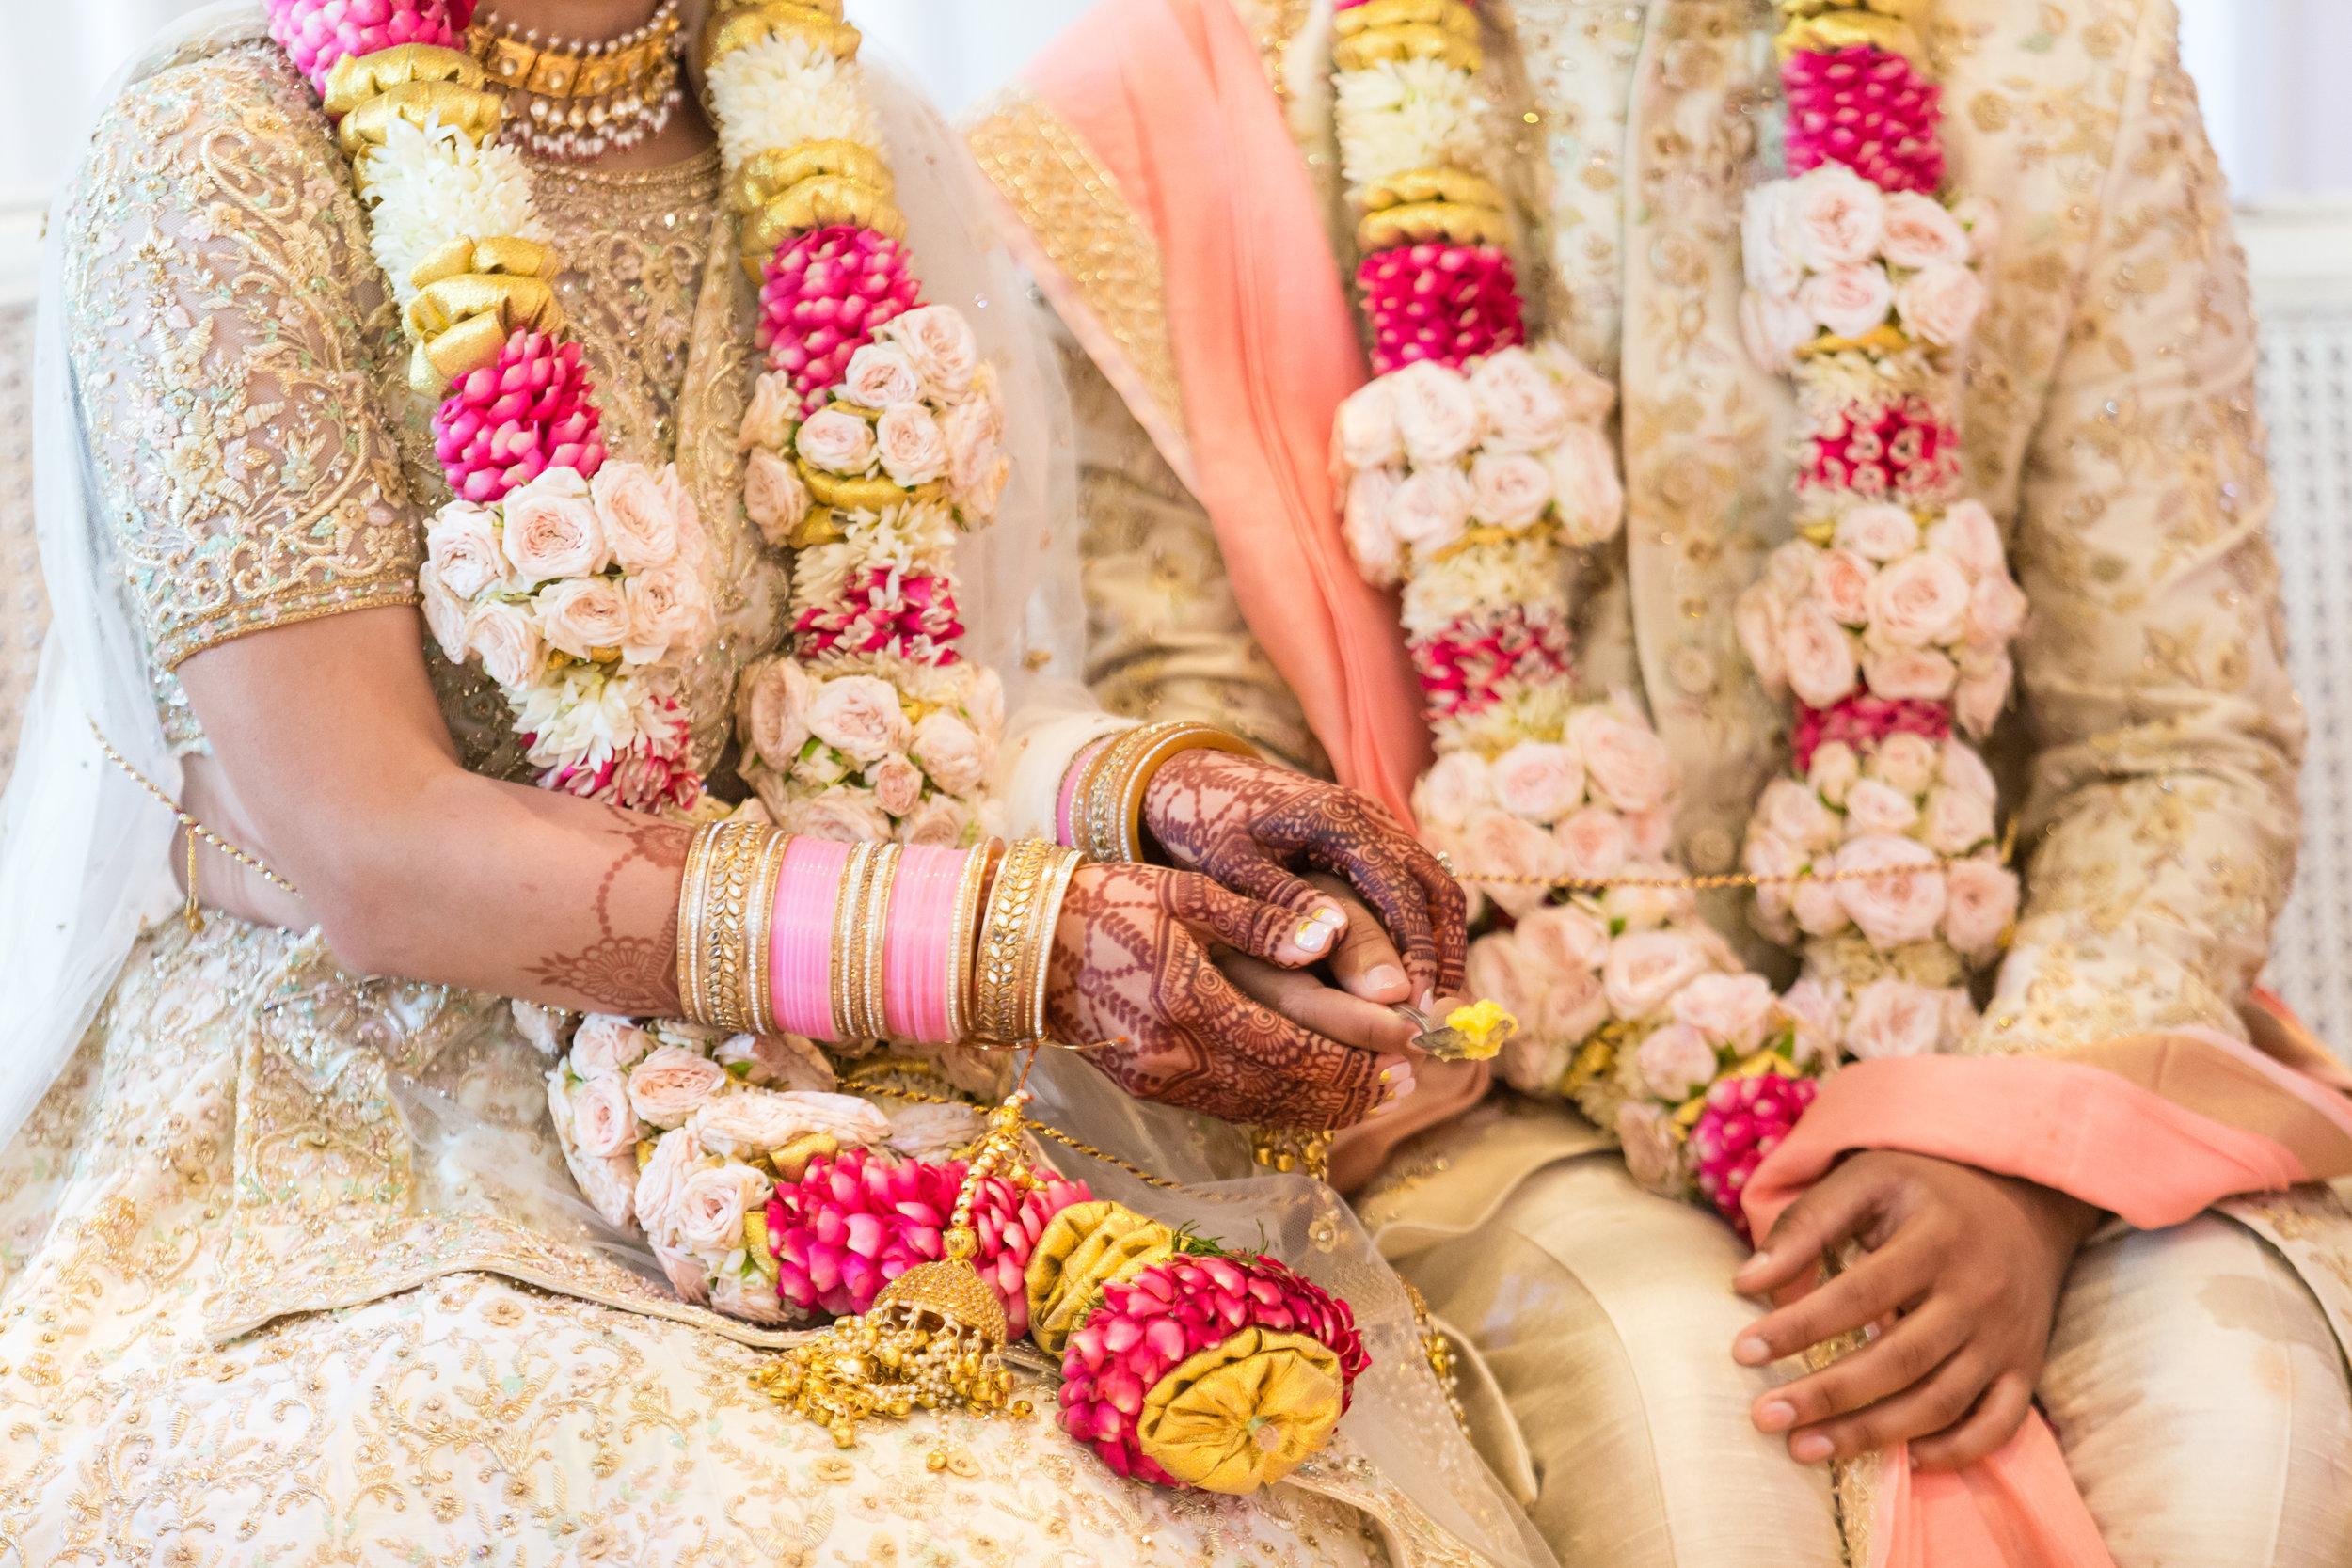 INDIAN WEDDING BRIDE AND GROOM CEREMONY CLOSEUP.jpg